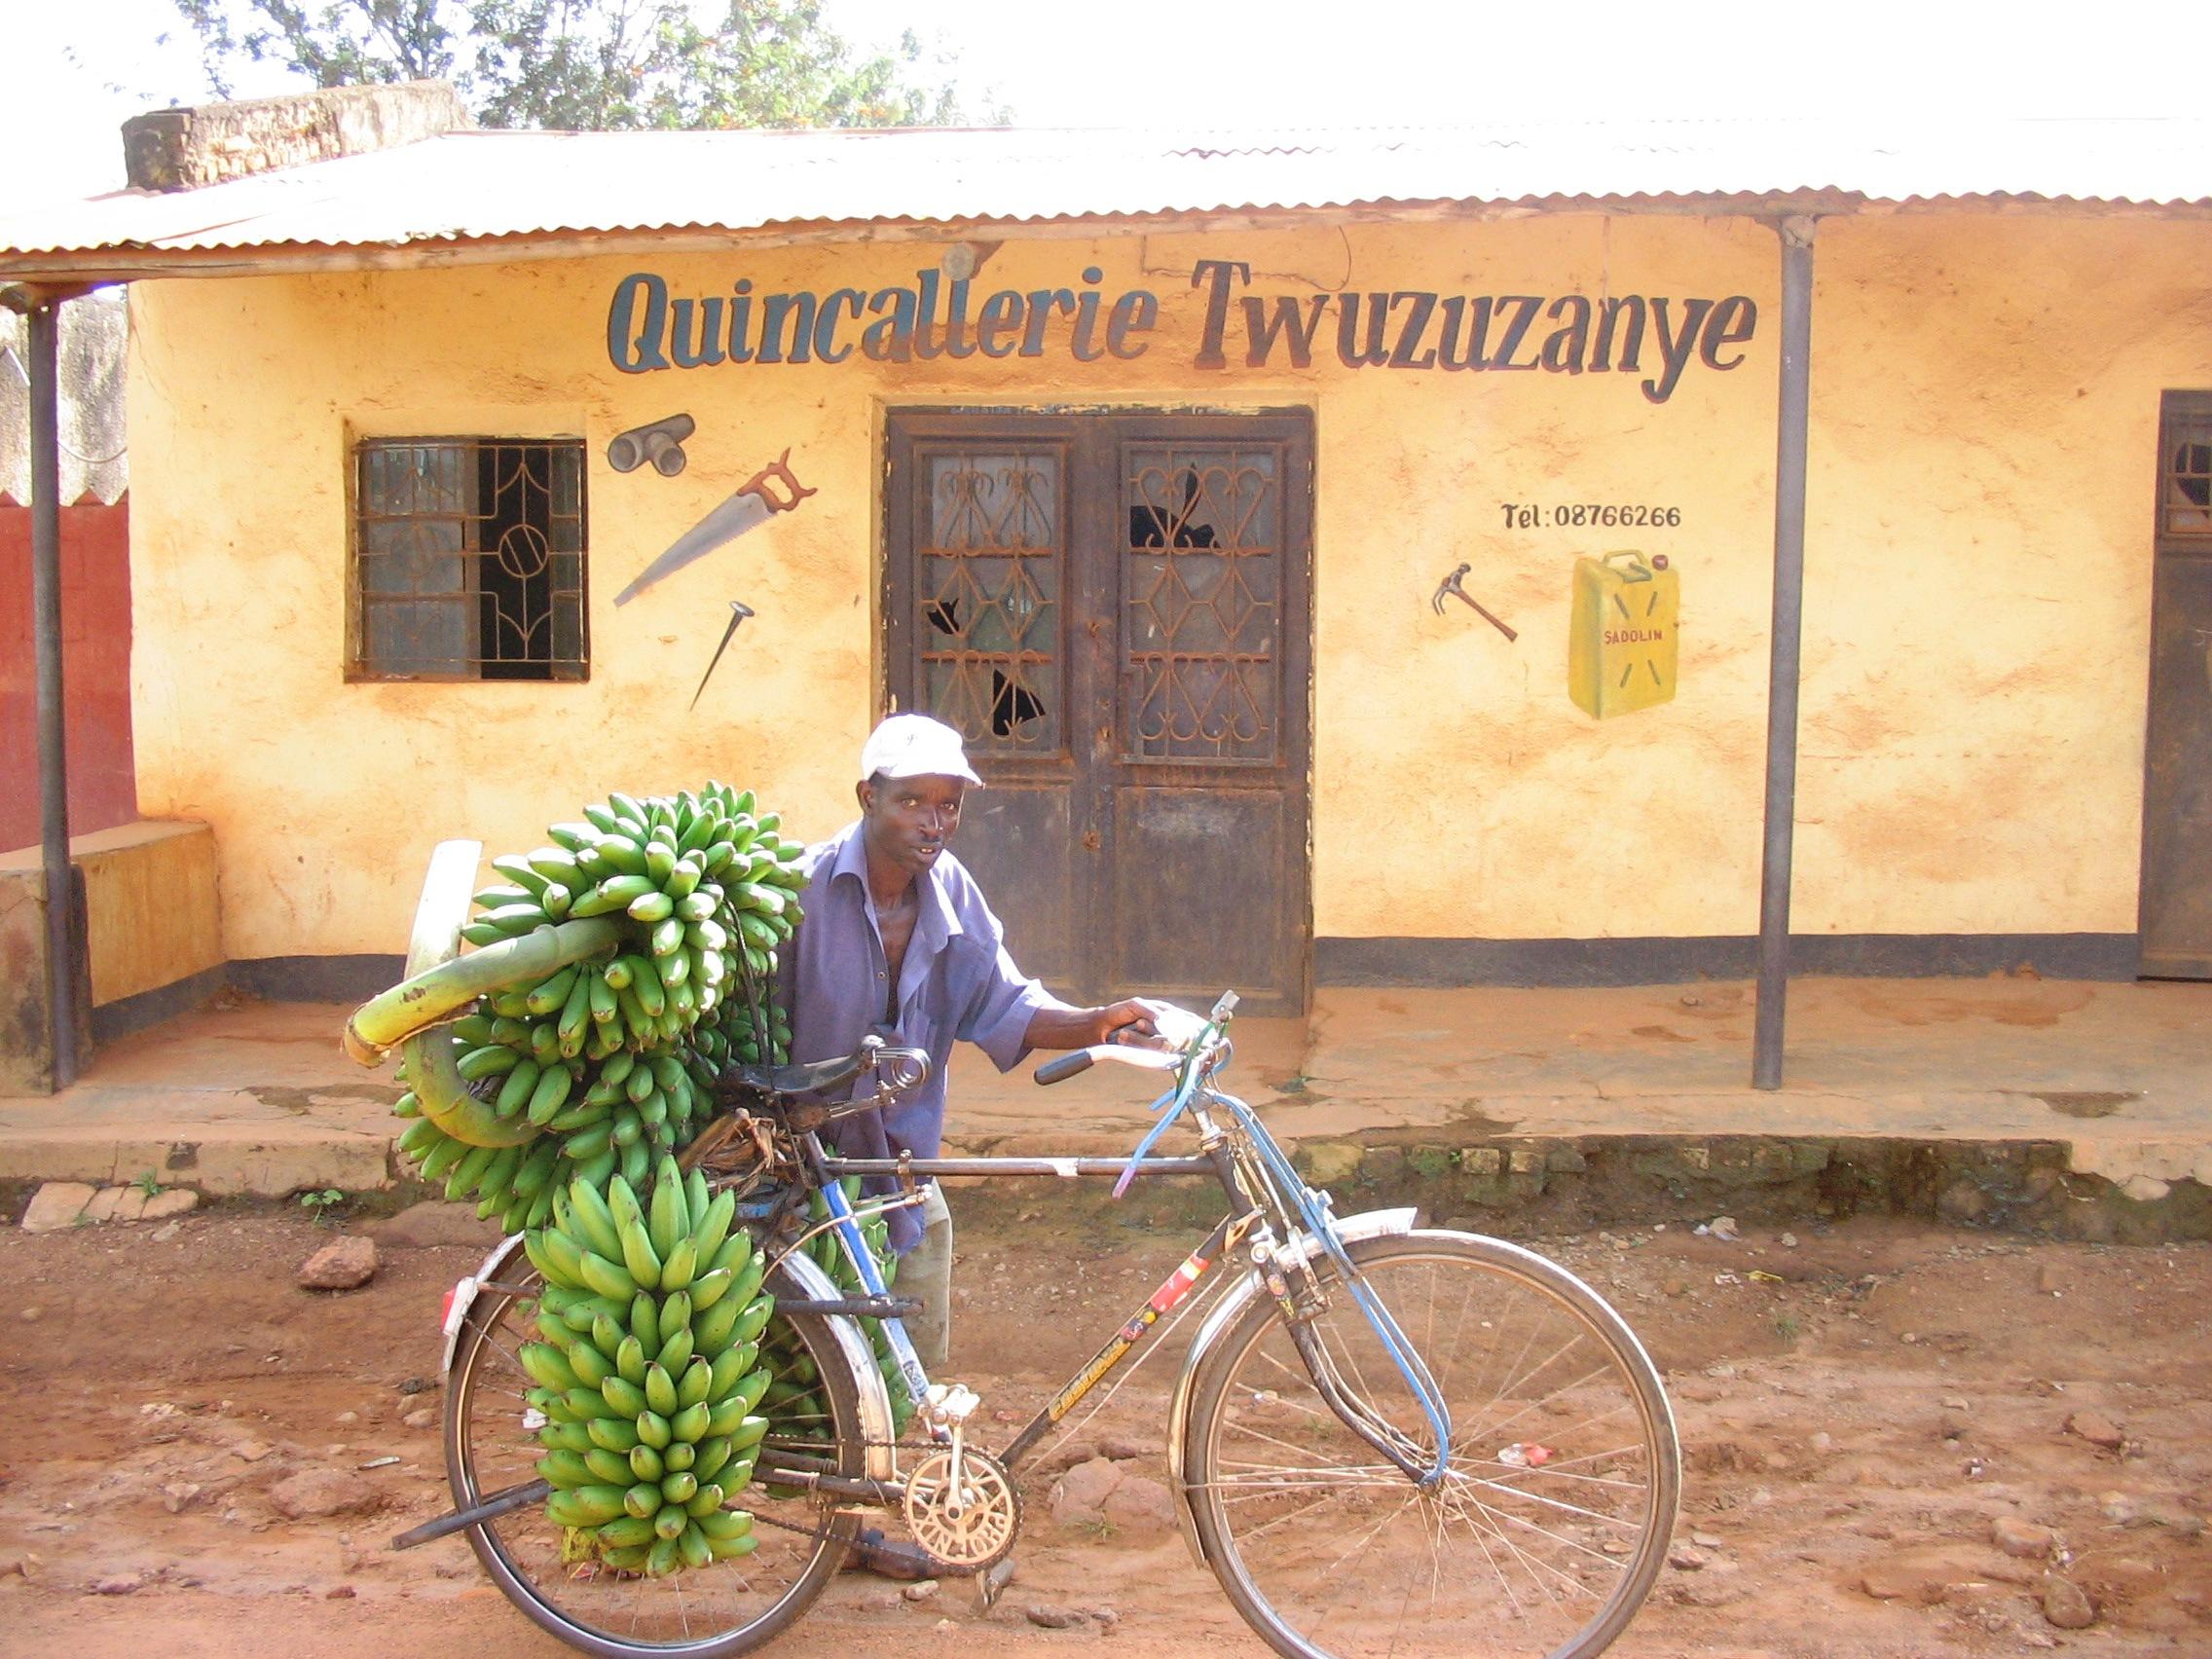 bike, bananas